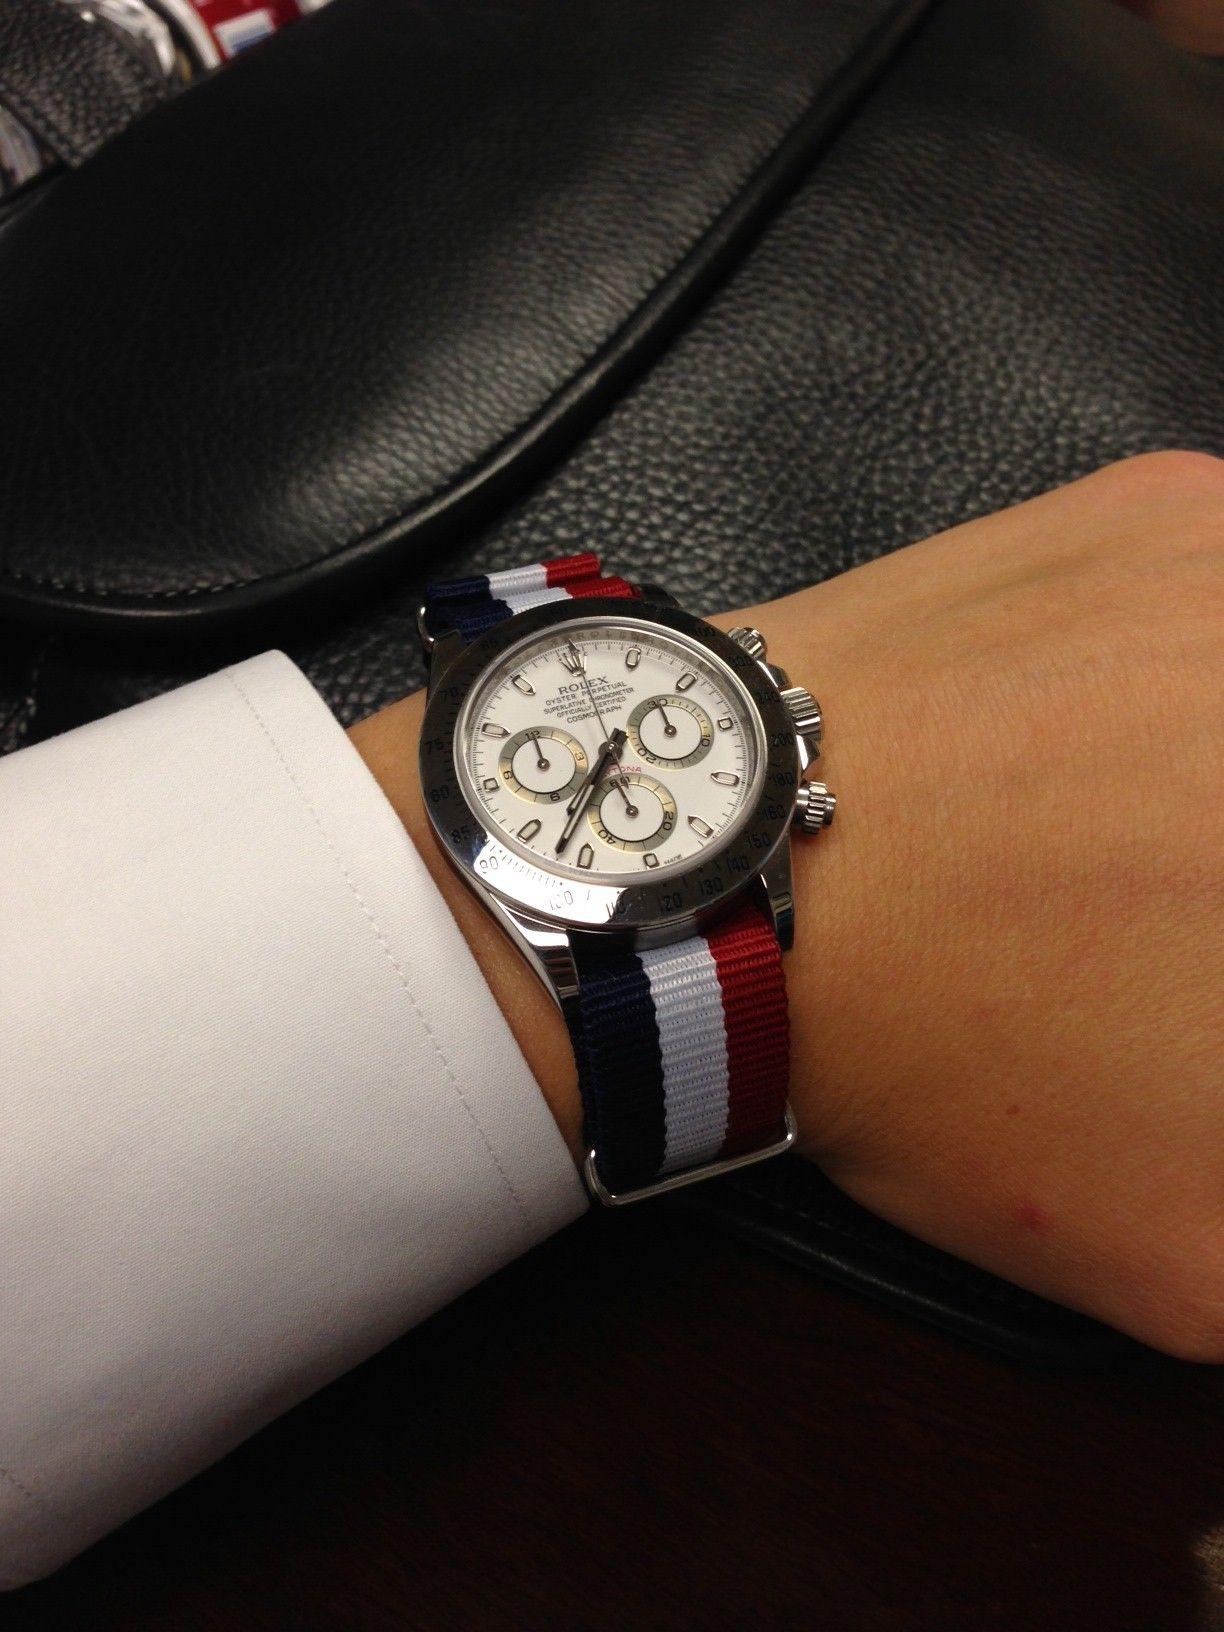 883b00d814ec6a Pin by United Watch Band on United Watch Bands   Rolex daytona ...